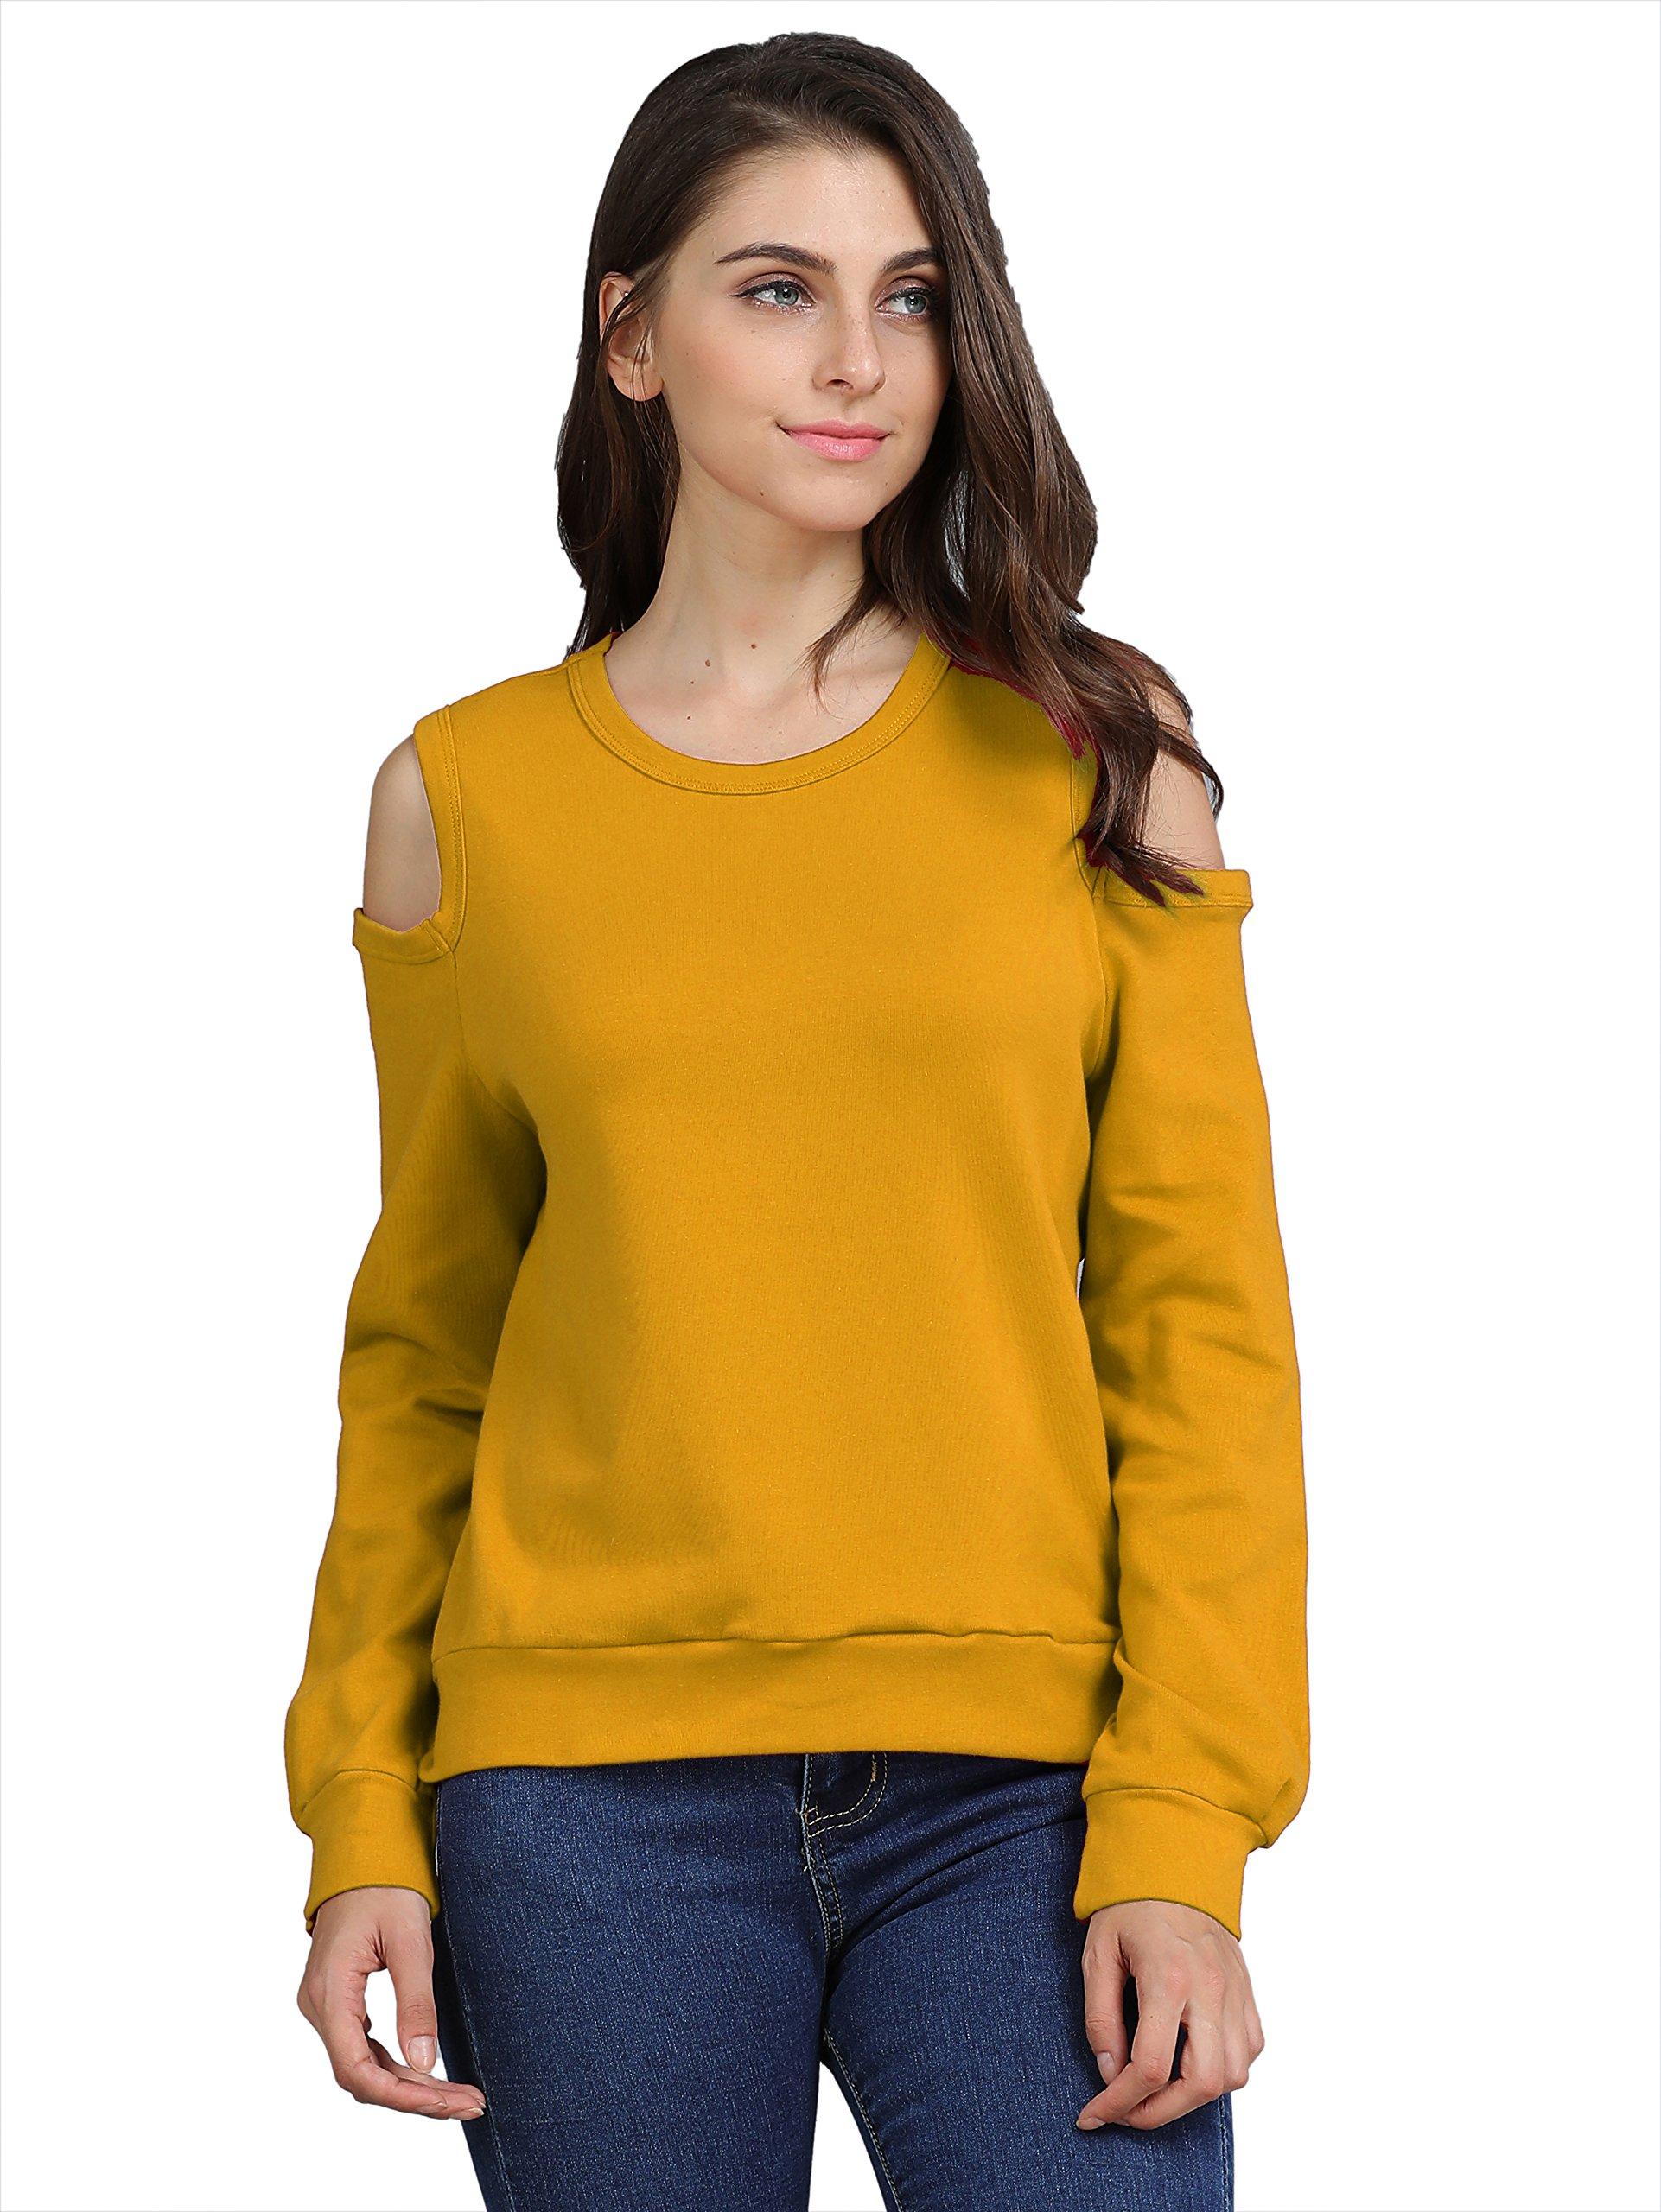 FURAMI Women's Sweatshirt Cold Shoulder Tops Casual Loose Long Sleeve Pullover Yellow M